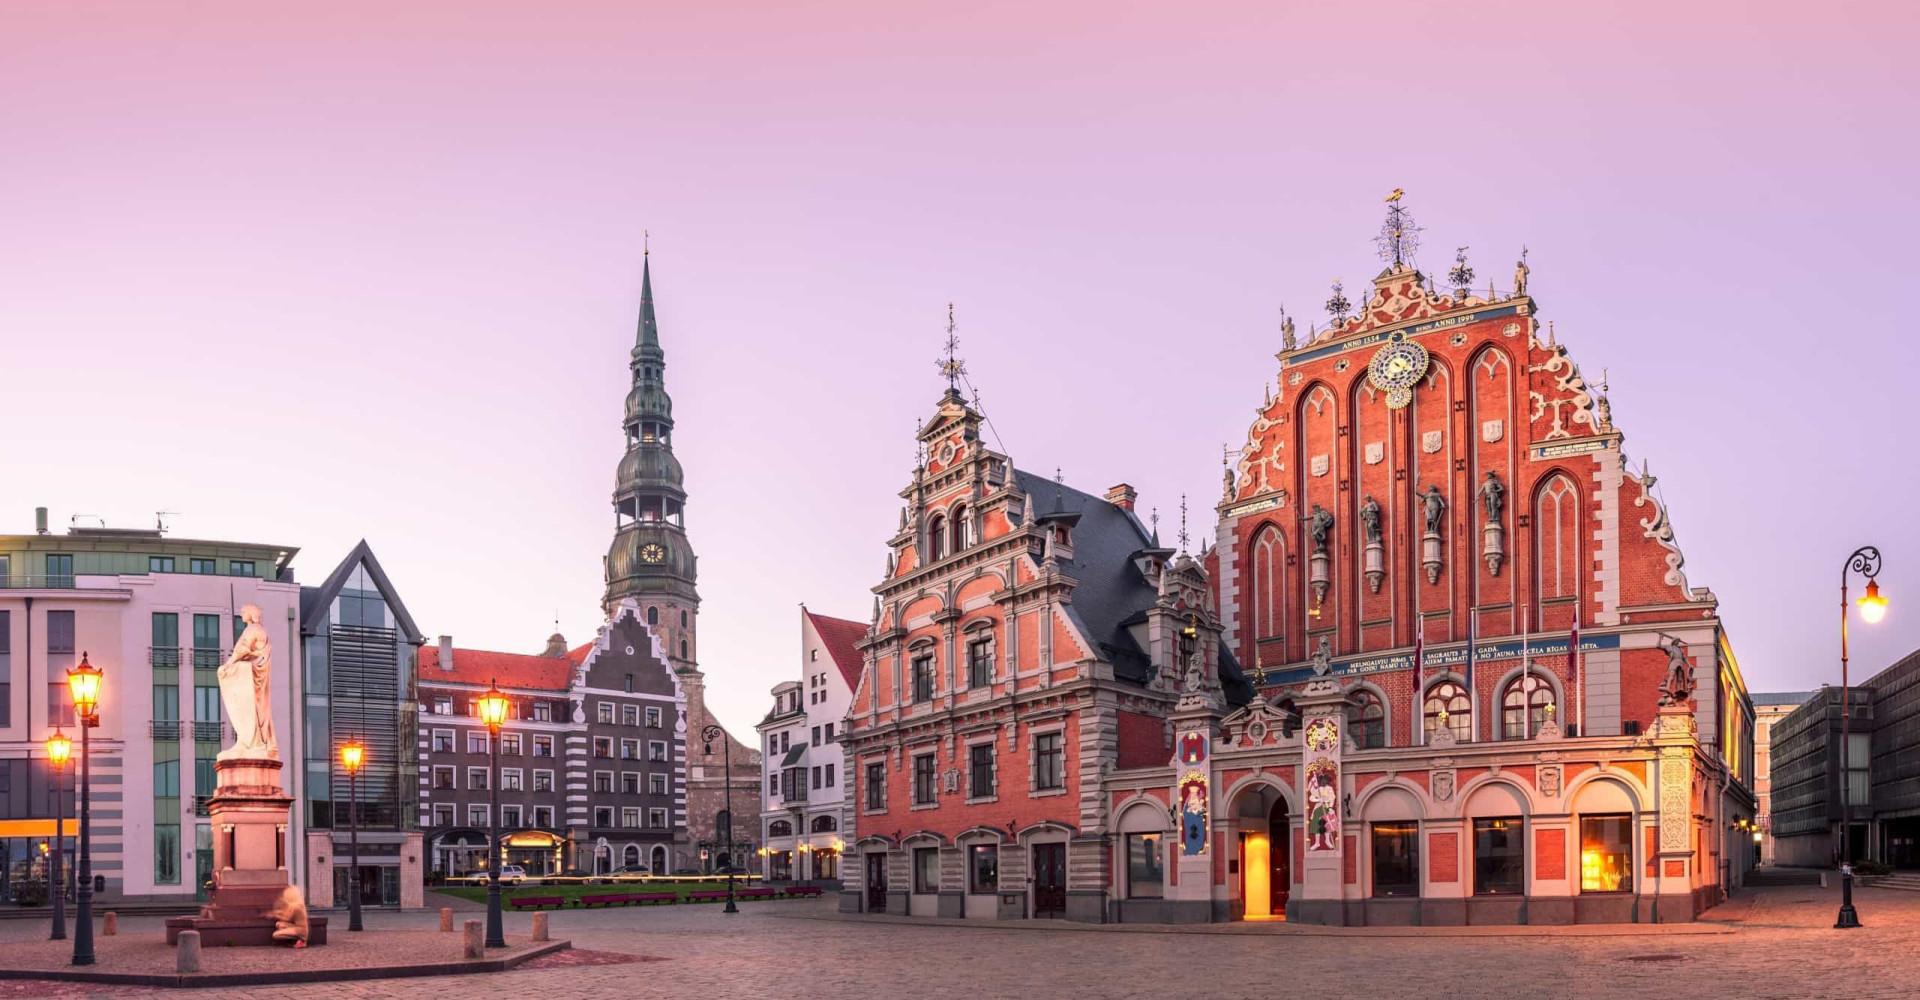 This quaint European city is the perfect autumn destination